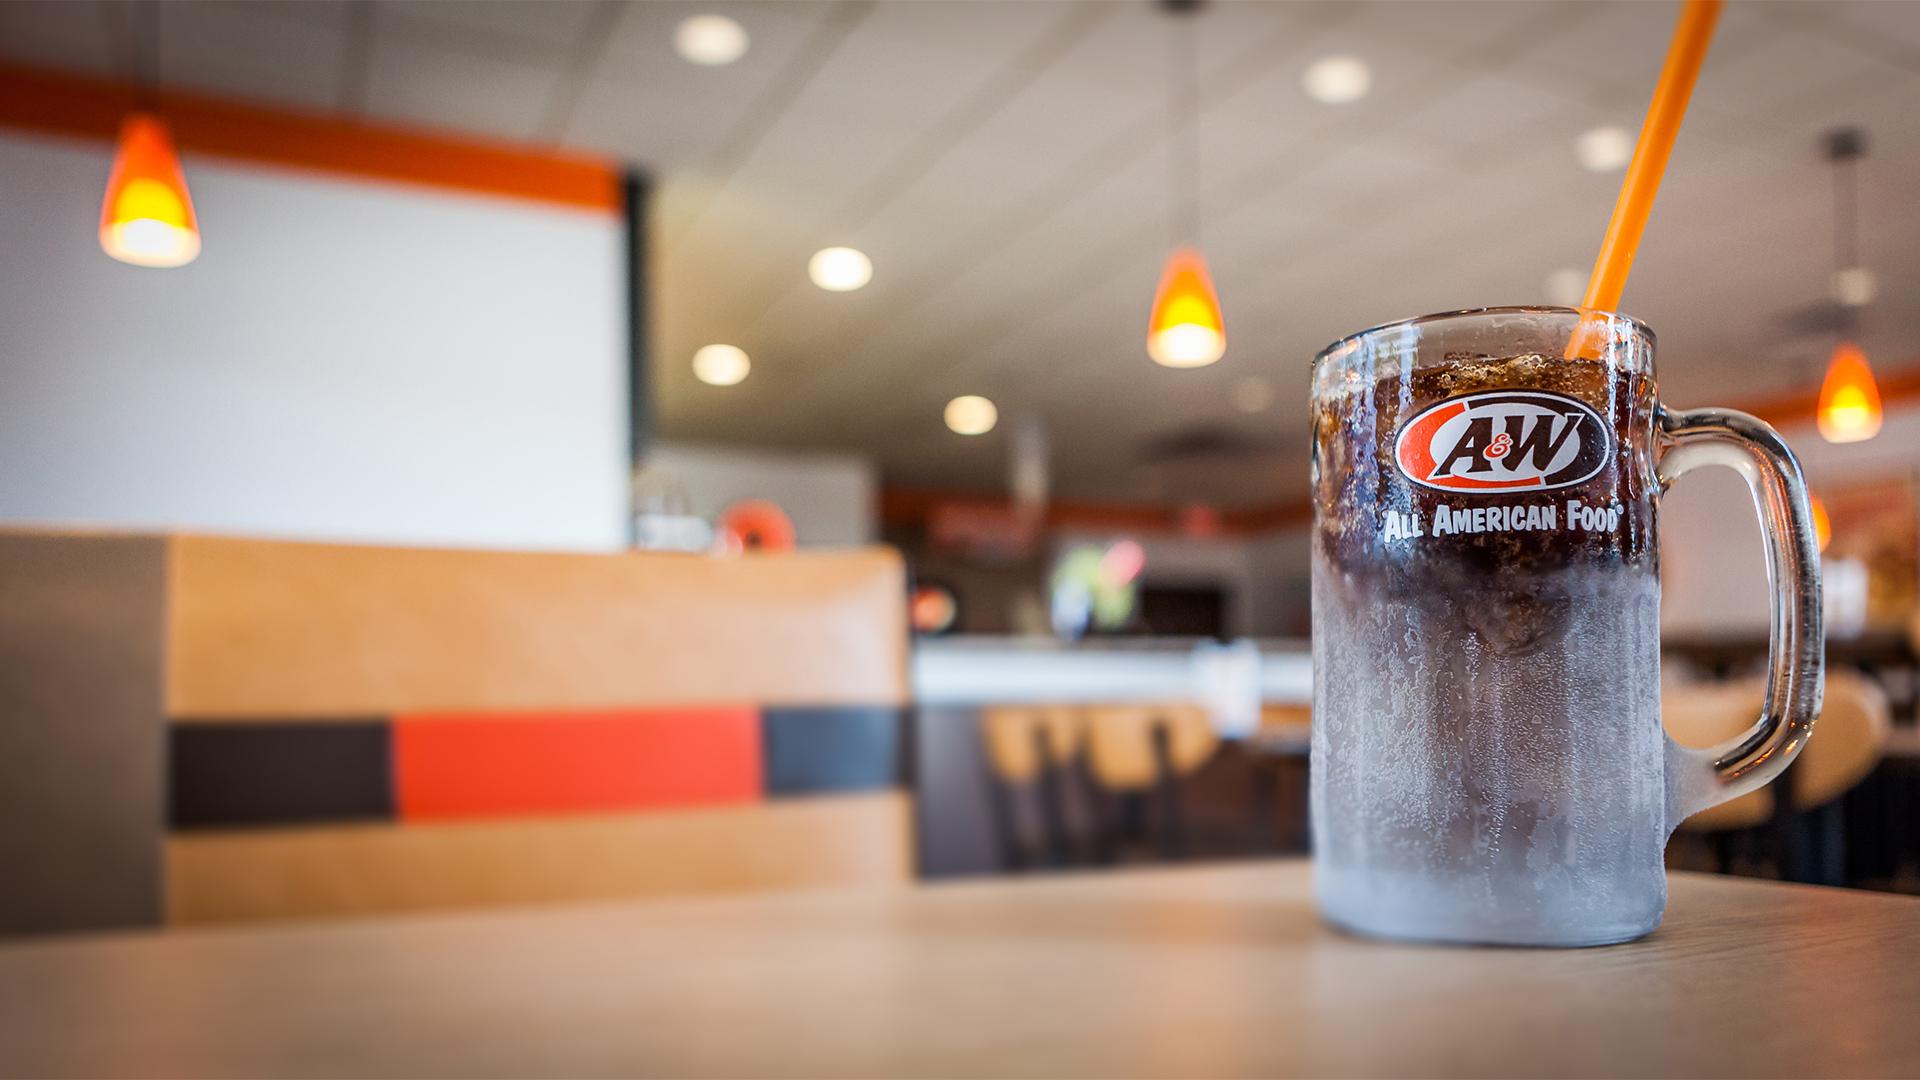 Root Beer Mug on Table